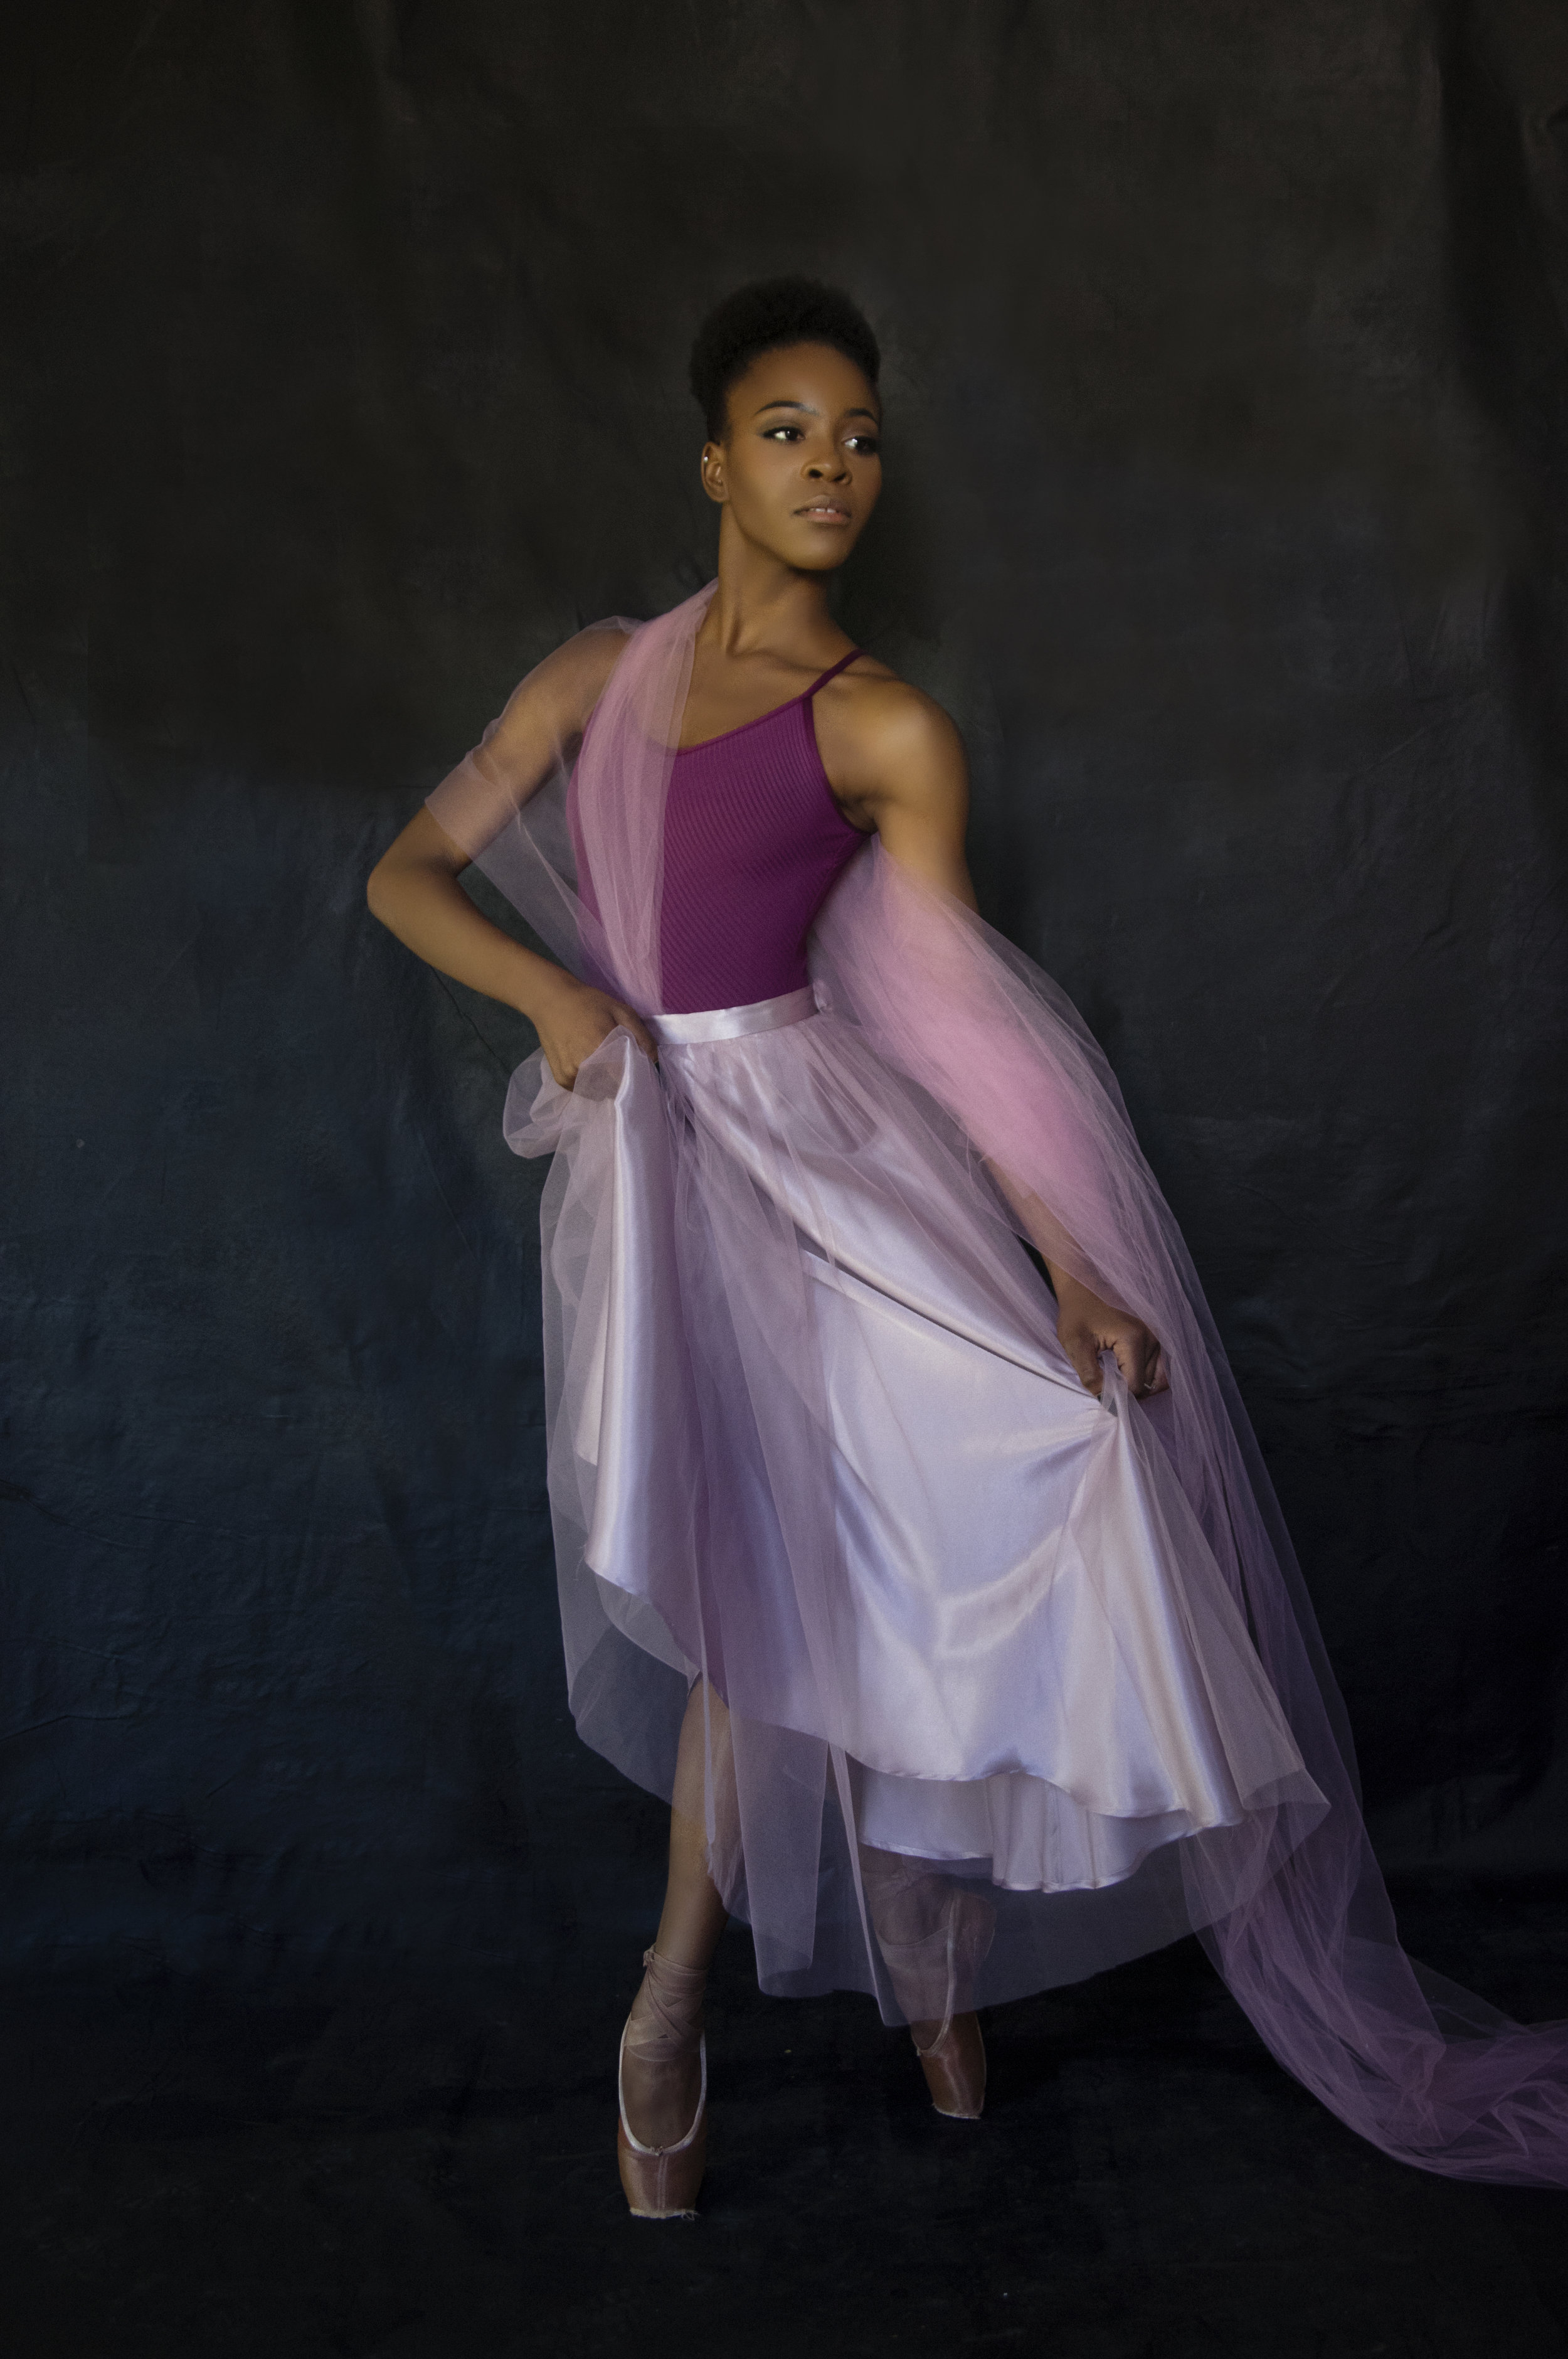 Heirloom portrait of a ballet dancer